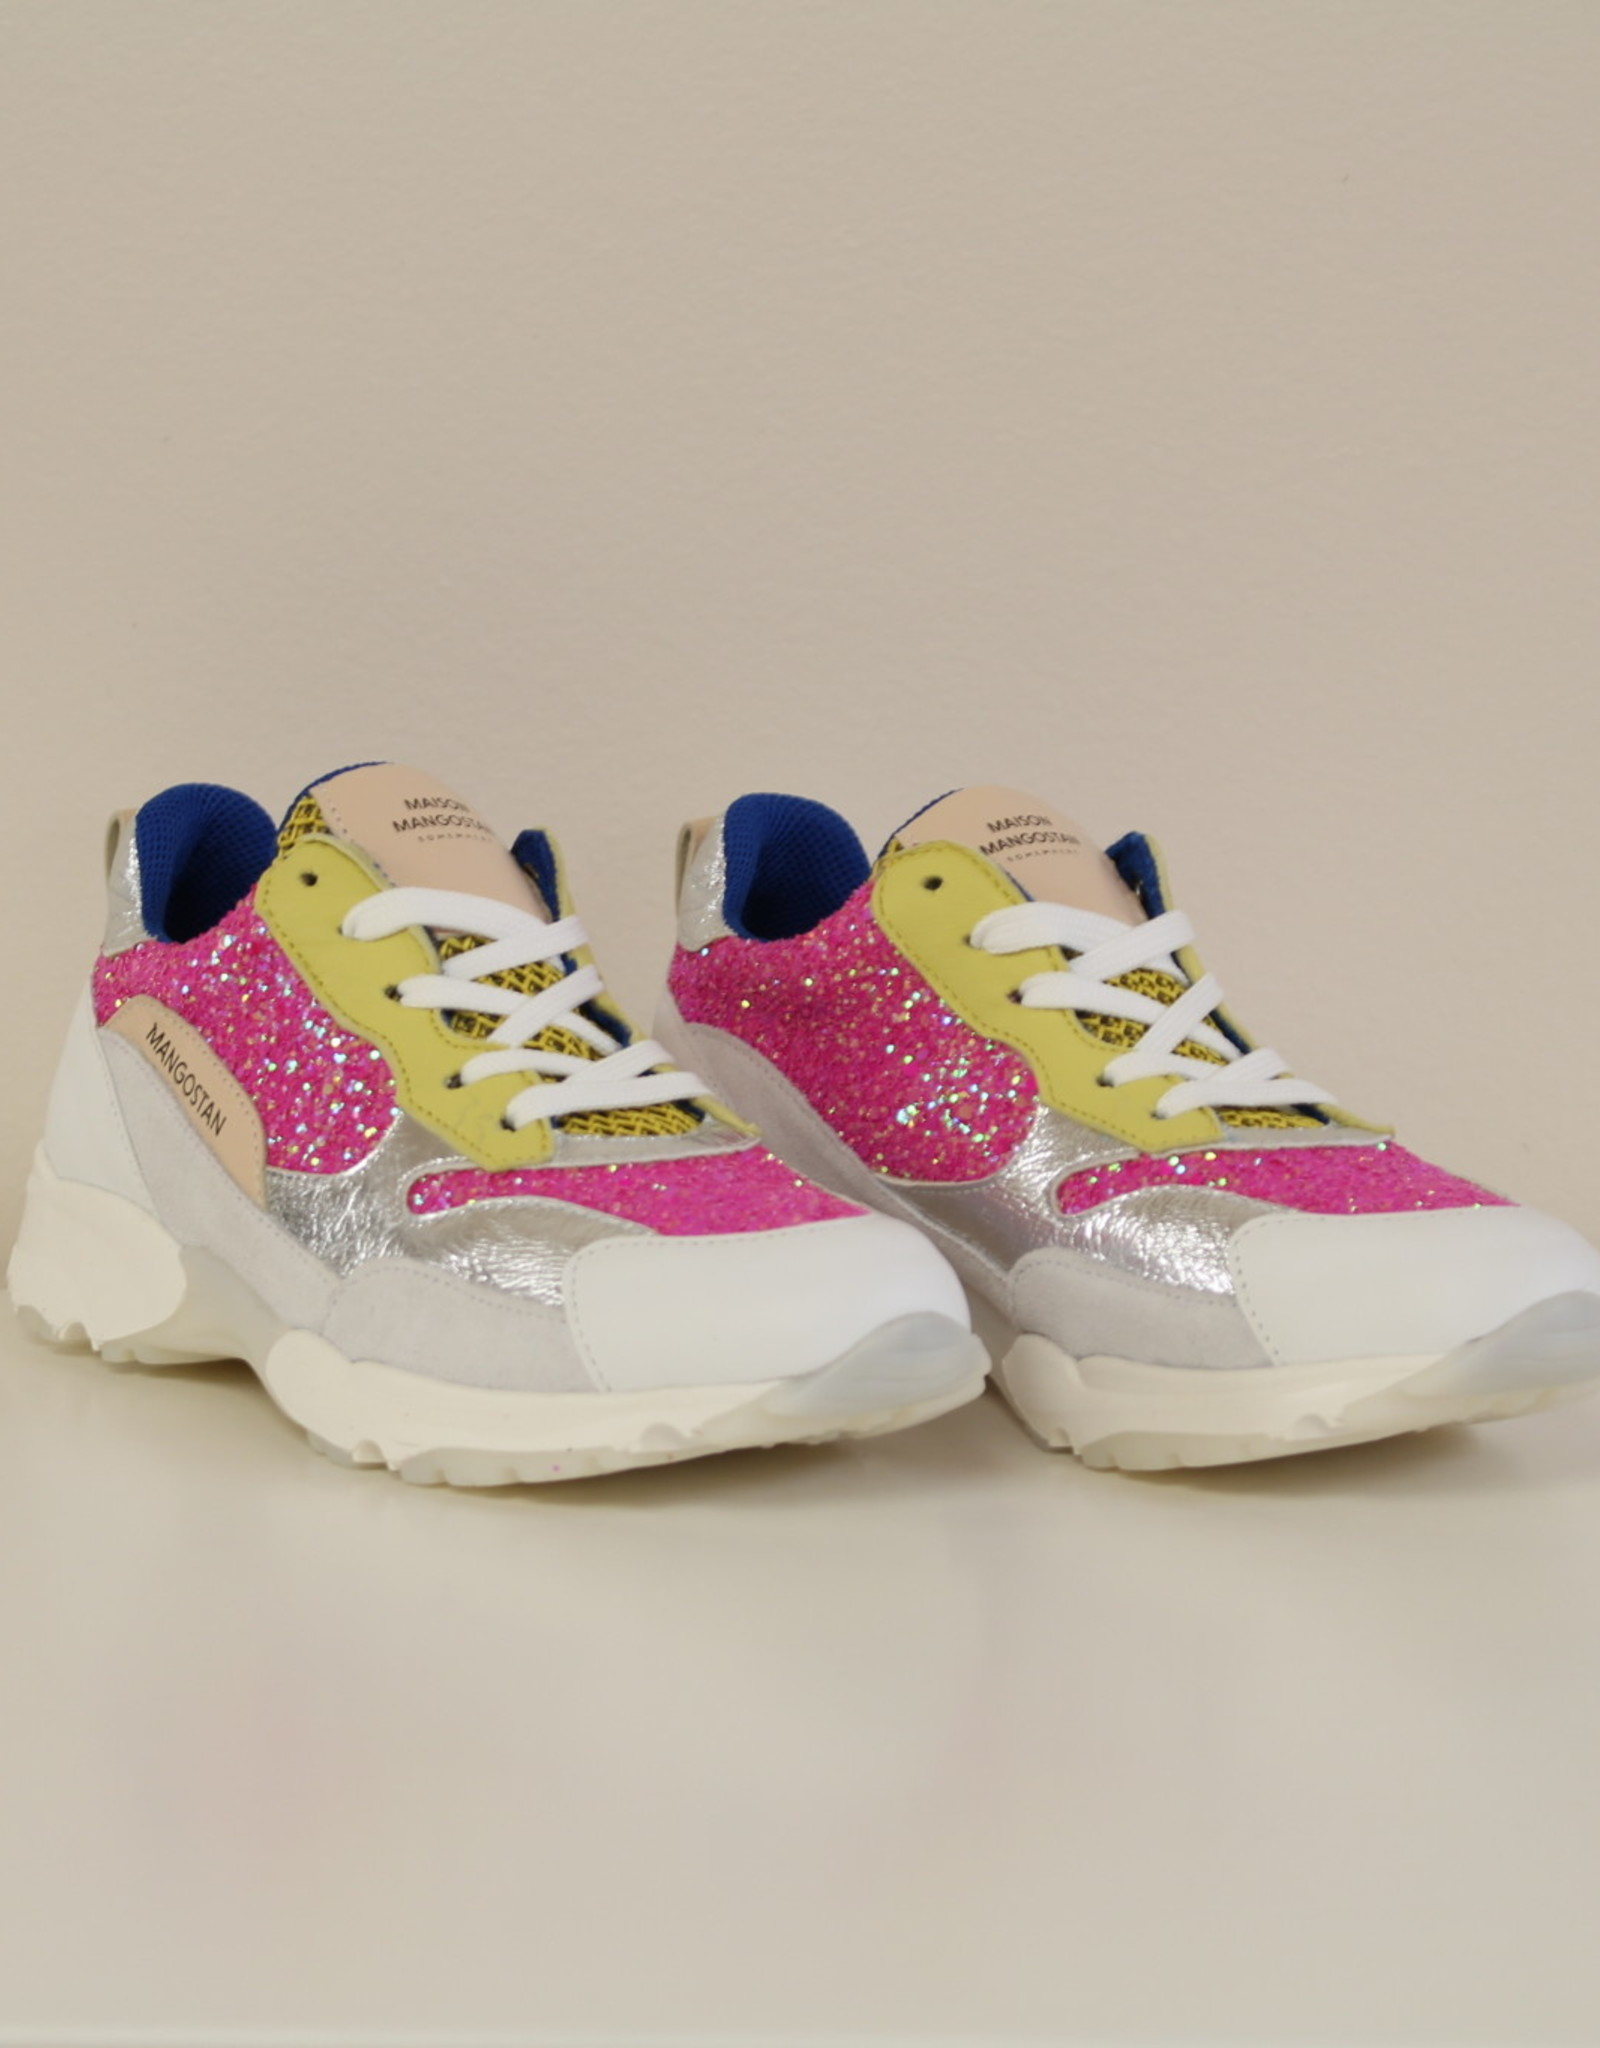 Maison Mangostan Goji sneaker